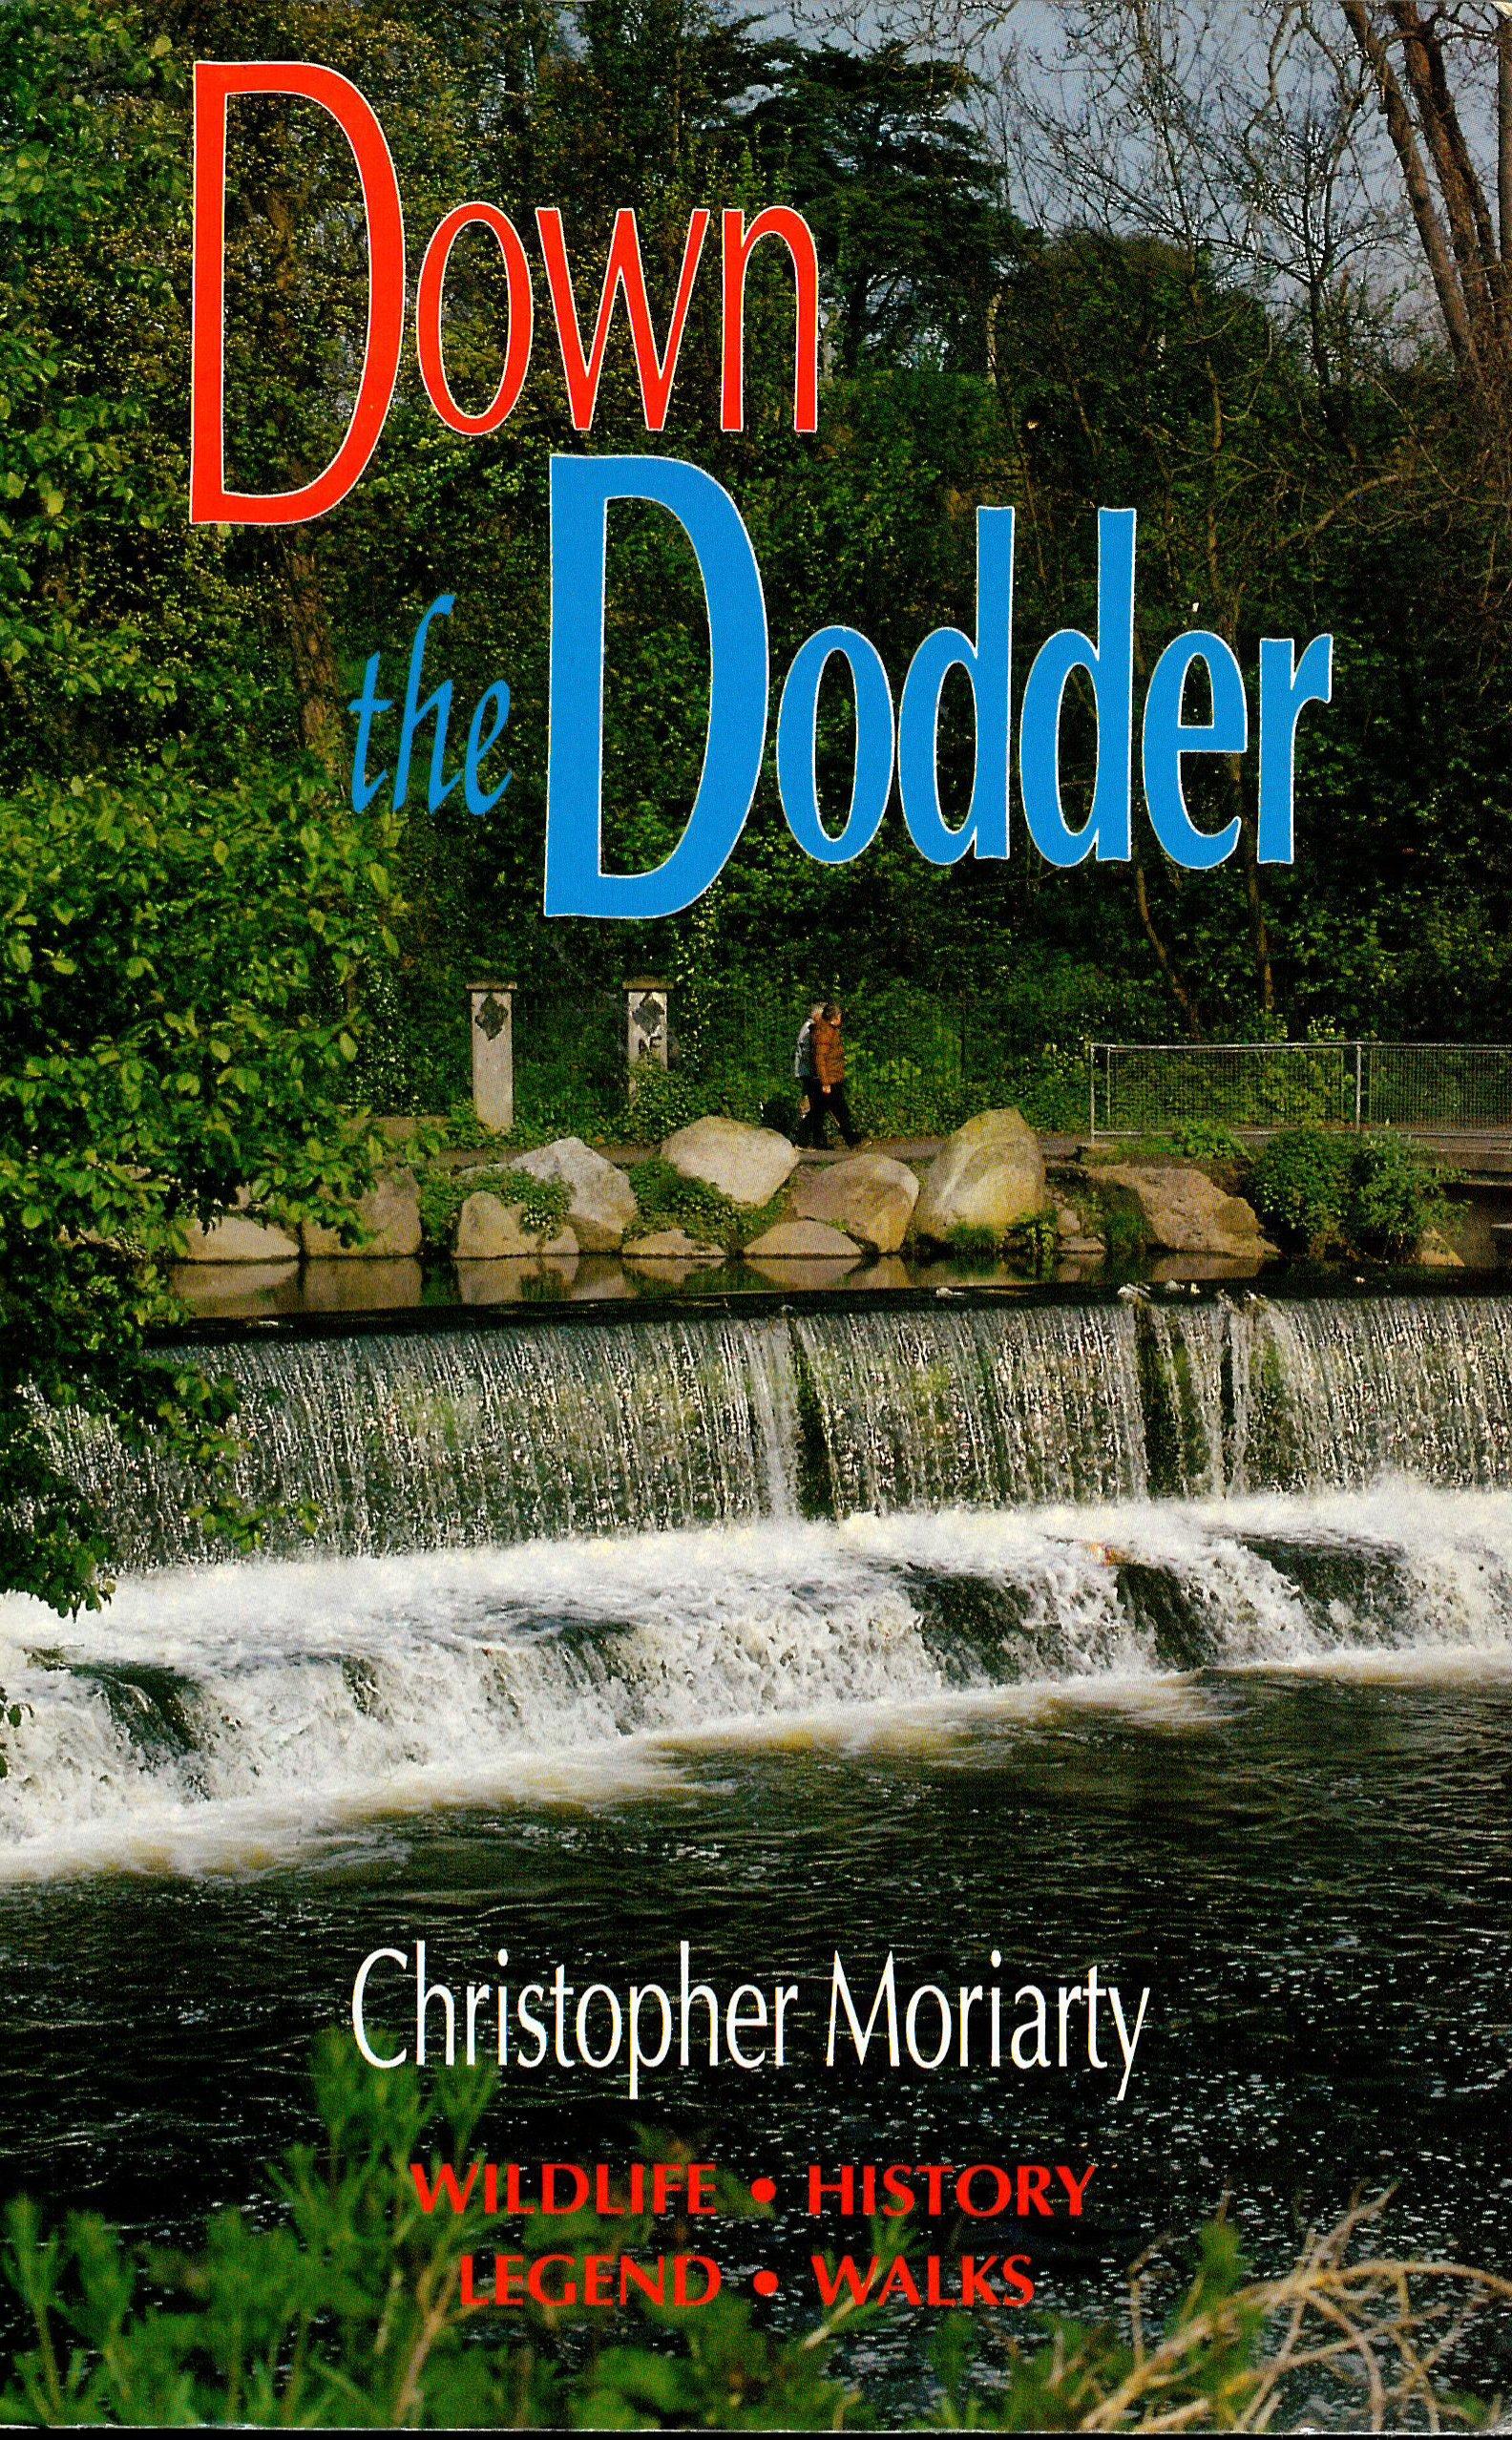 Down The Dodder: Wildlife, History, Legend, Walks: Christopher Moriarty:  9780863272868: Amazon: Books